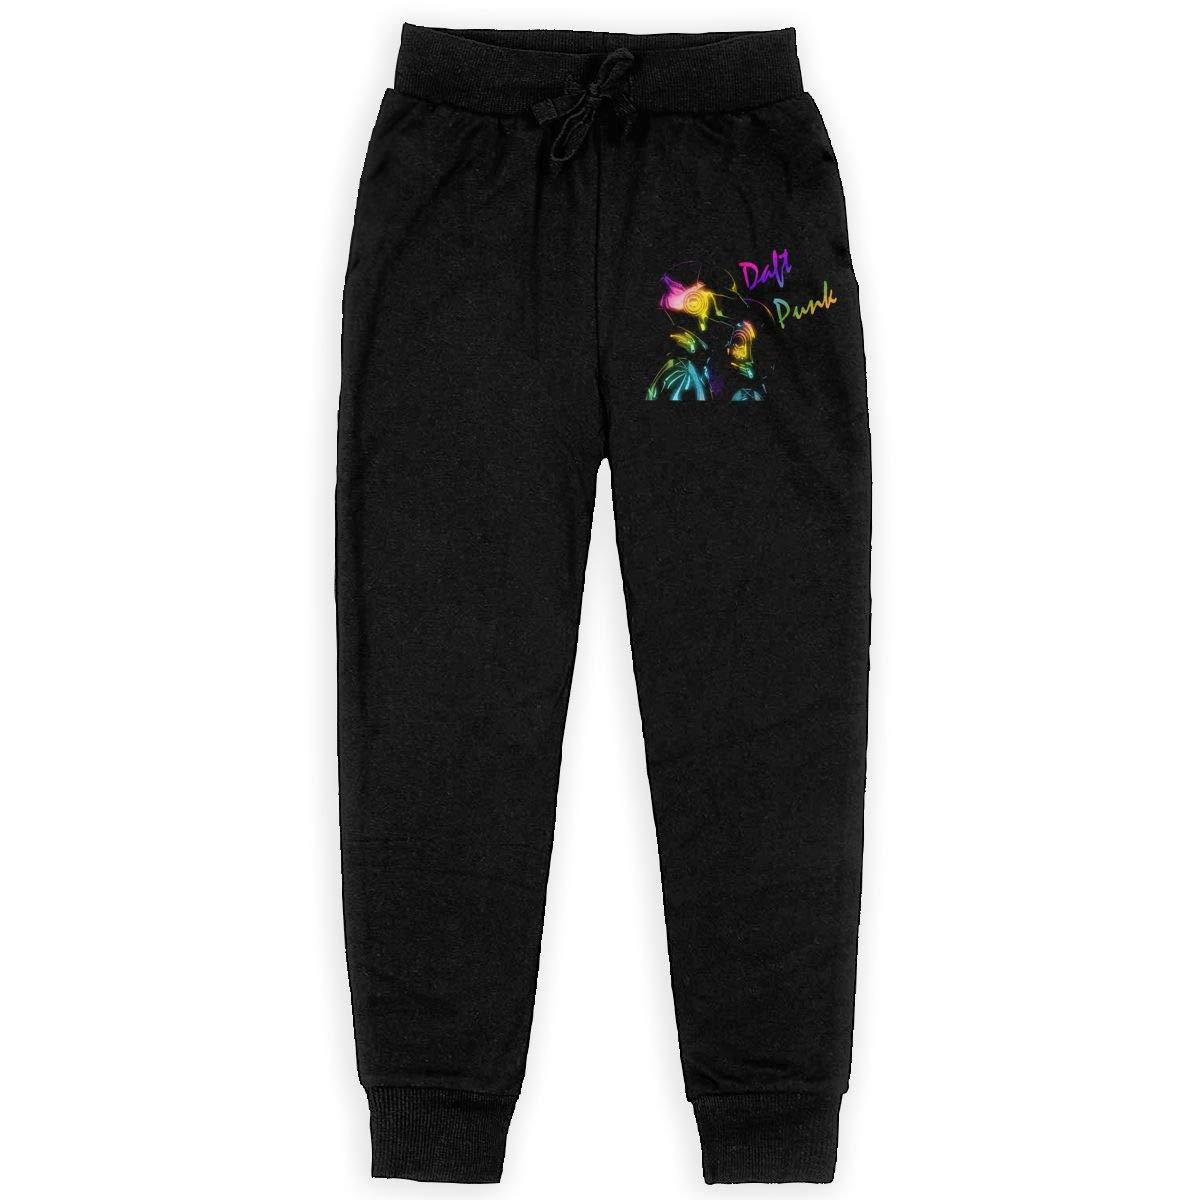 WustegHoodie Teenage Daft Punk Random Access Memories Music Band Teen Sweatpants Sport Trousers Back Pocket Black